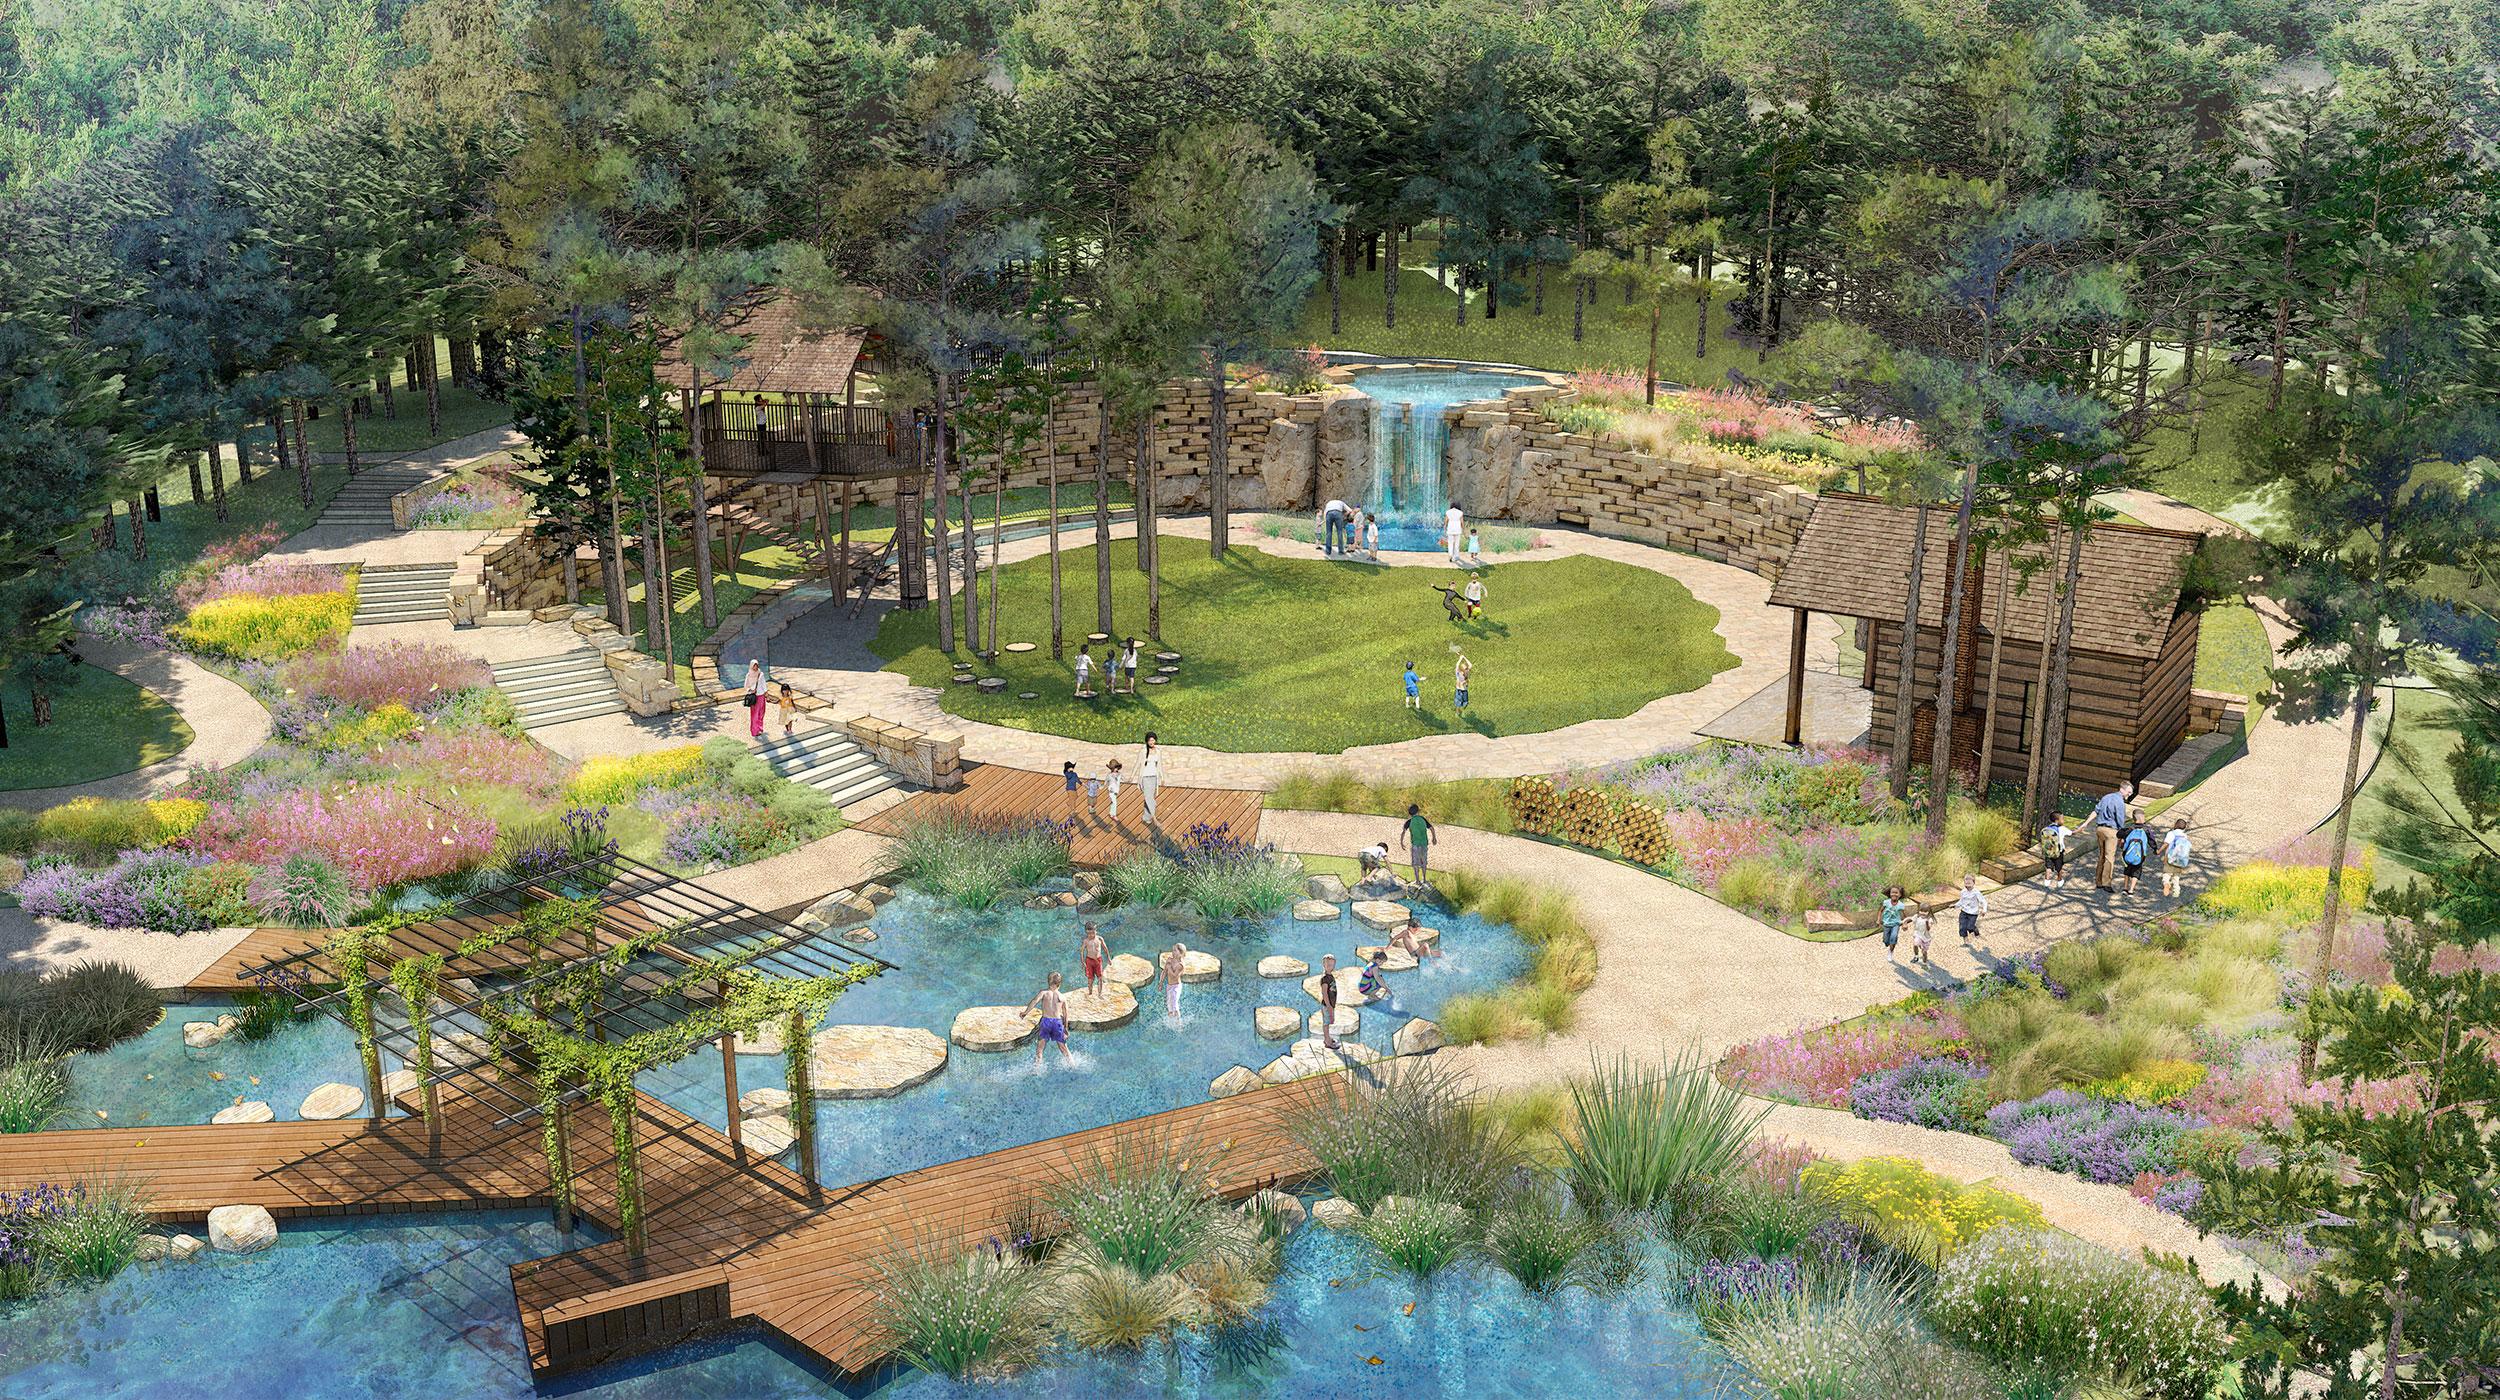 Children's Secret Adventure Garden at Columbus Botanical Garden